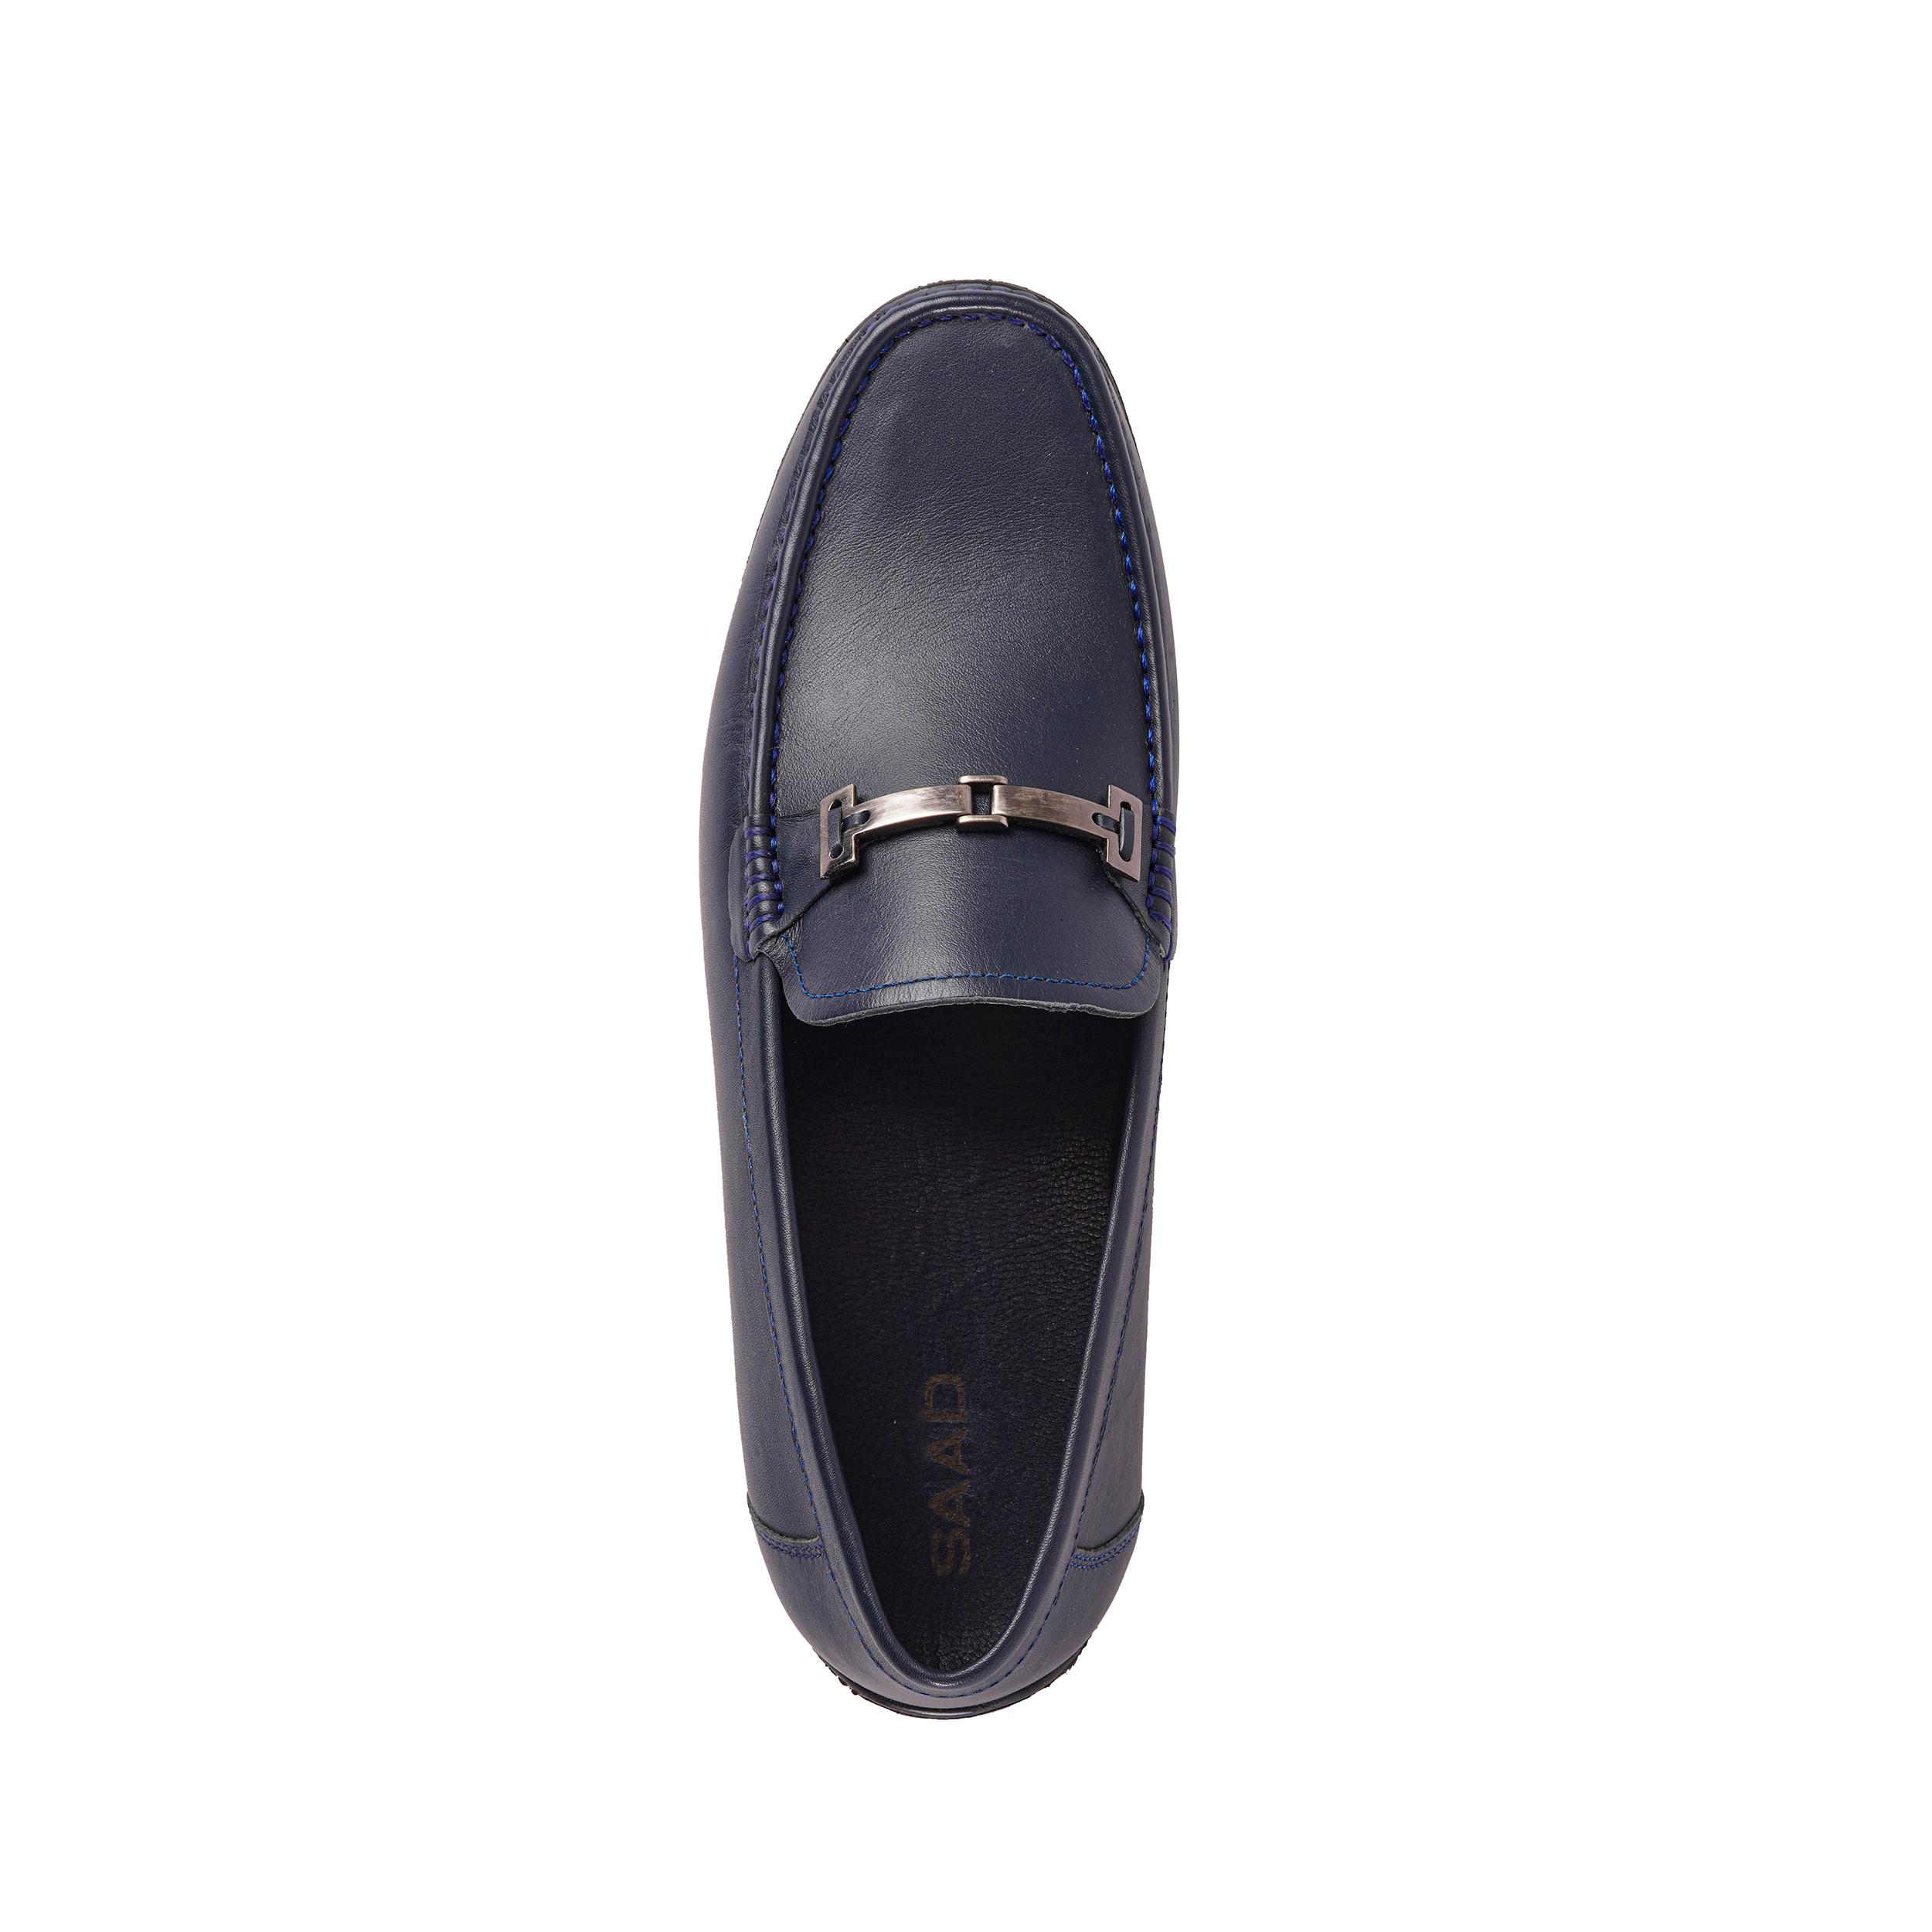 کفش روزمره مردانه صاد YA4102